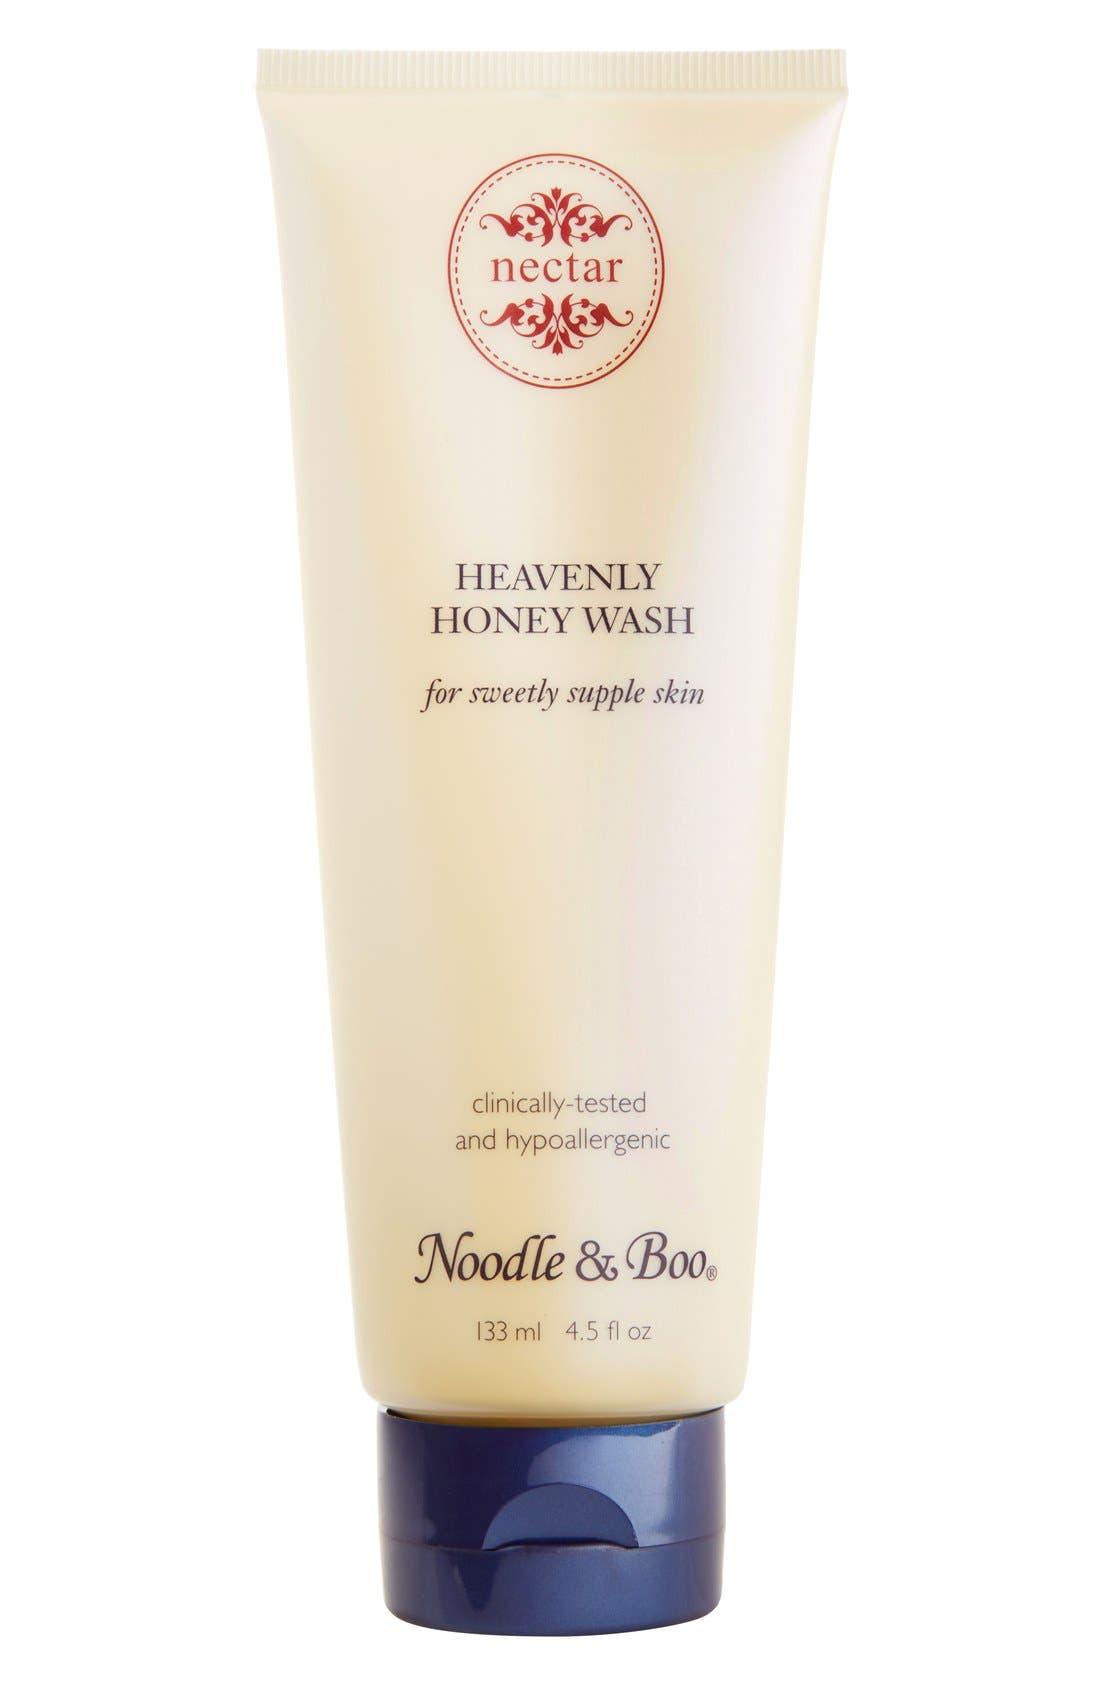 Noodle & Boo nectar - Heavenly Honey Body Wash